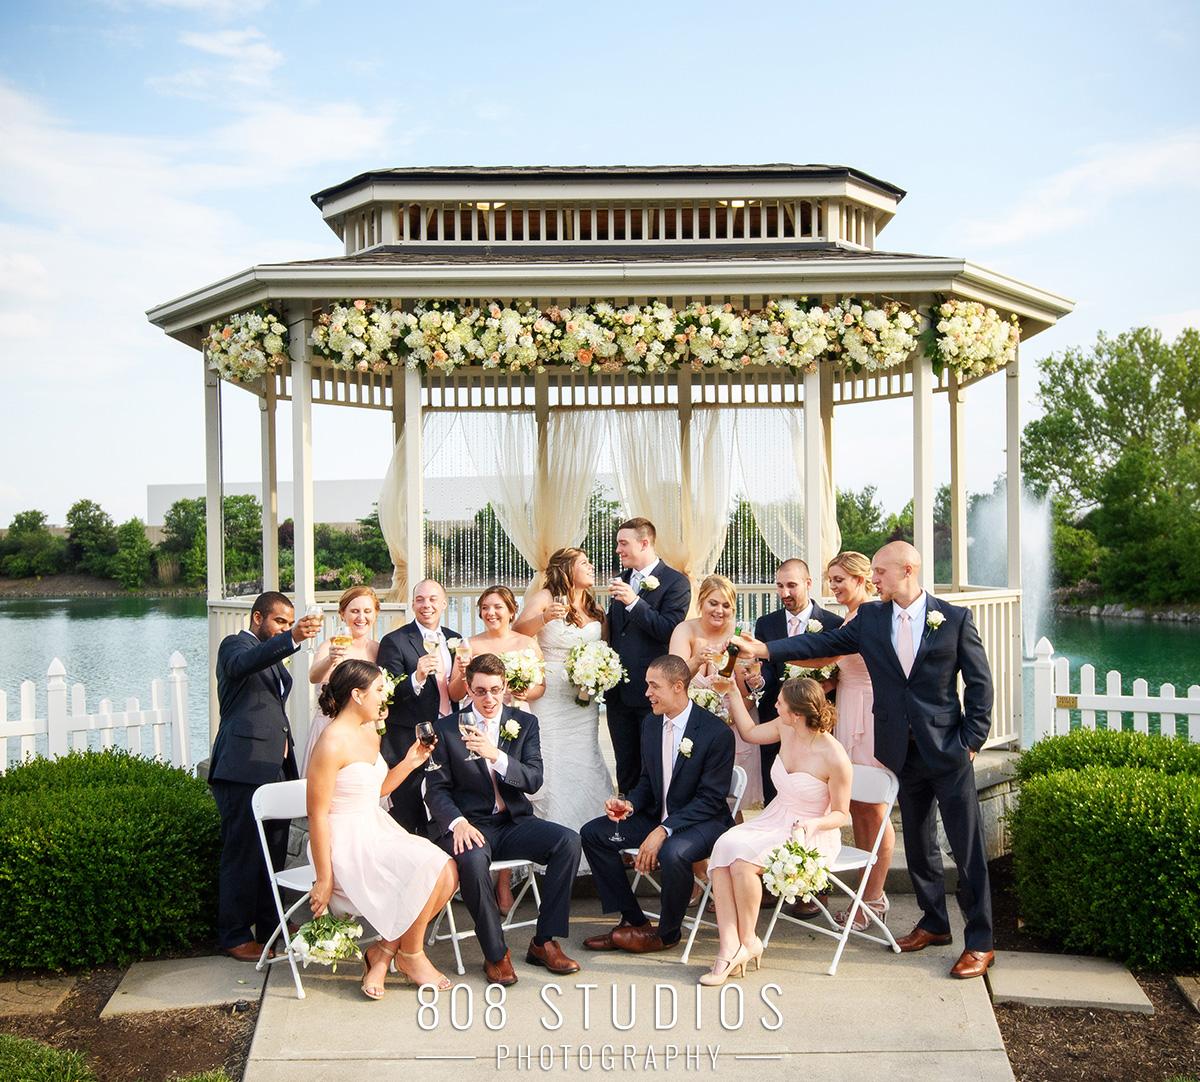 Dayton Wedding Photographer 808 STUDIOS 802_9973 copy